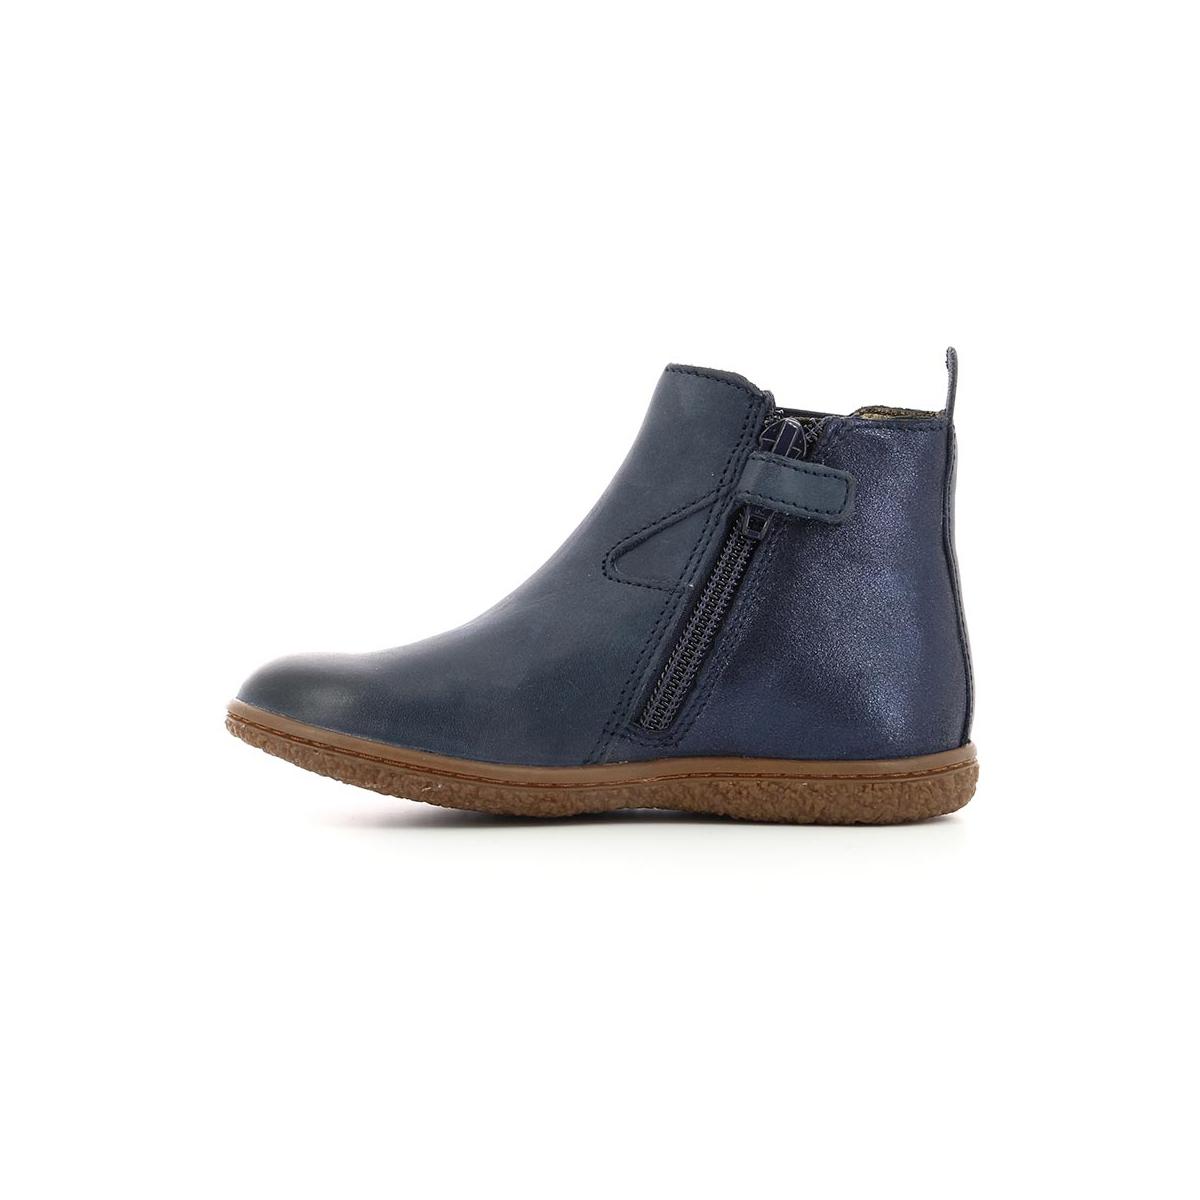 901e469931f1a Chaussures Enfant VERMILLON MARINE - Kickers